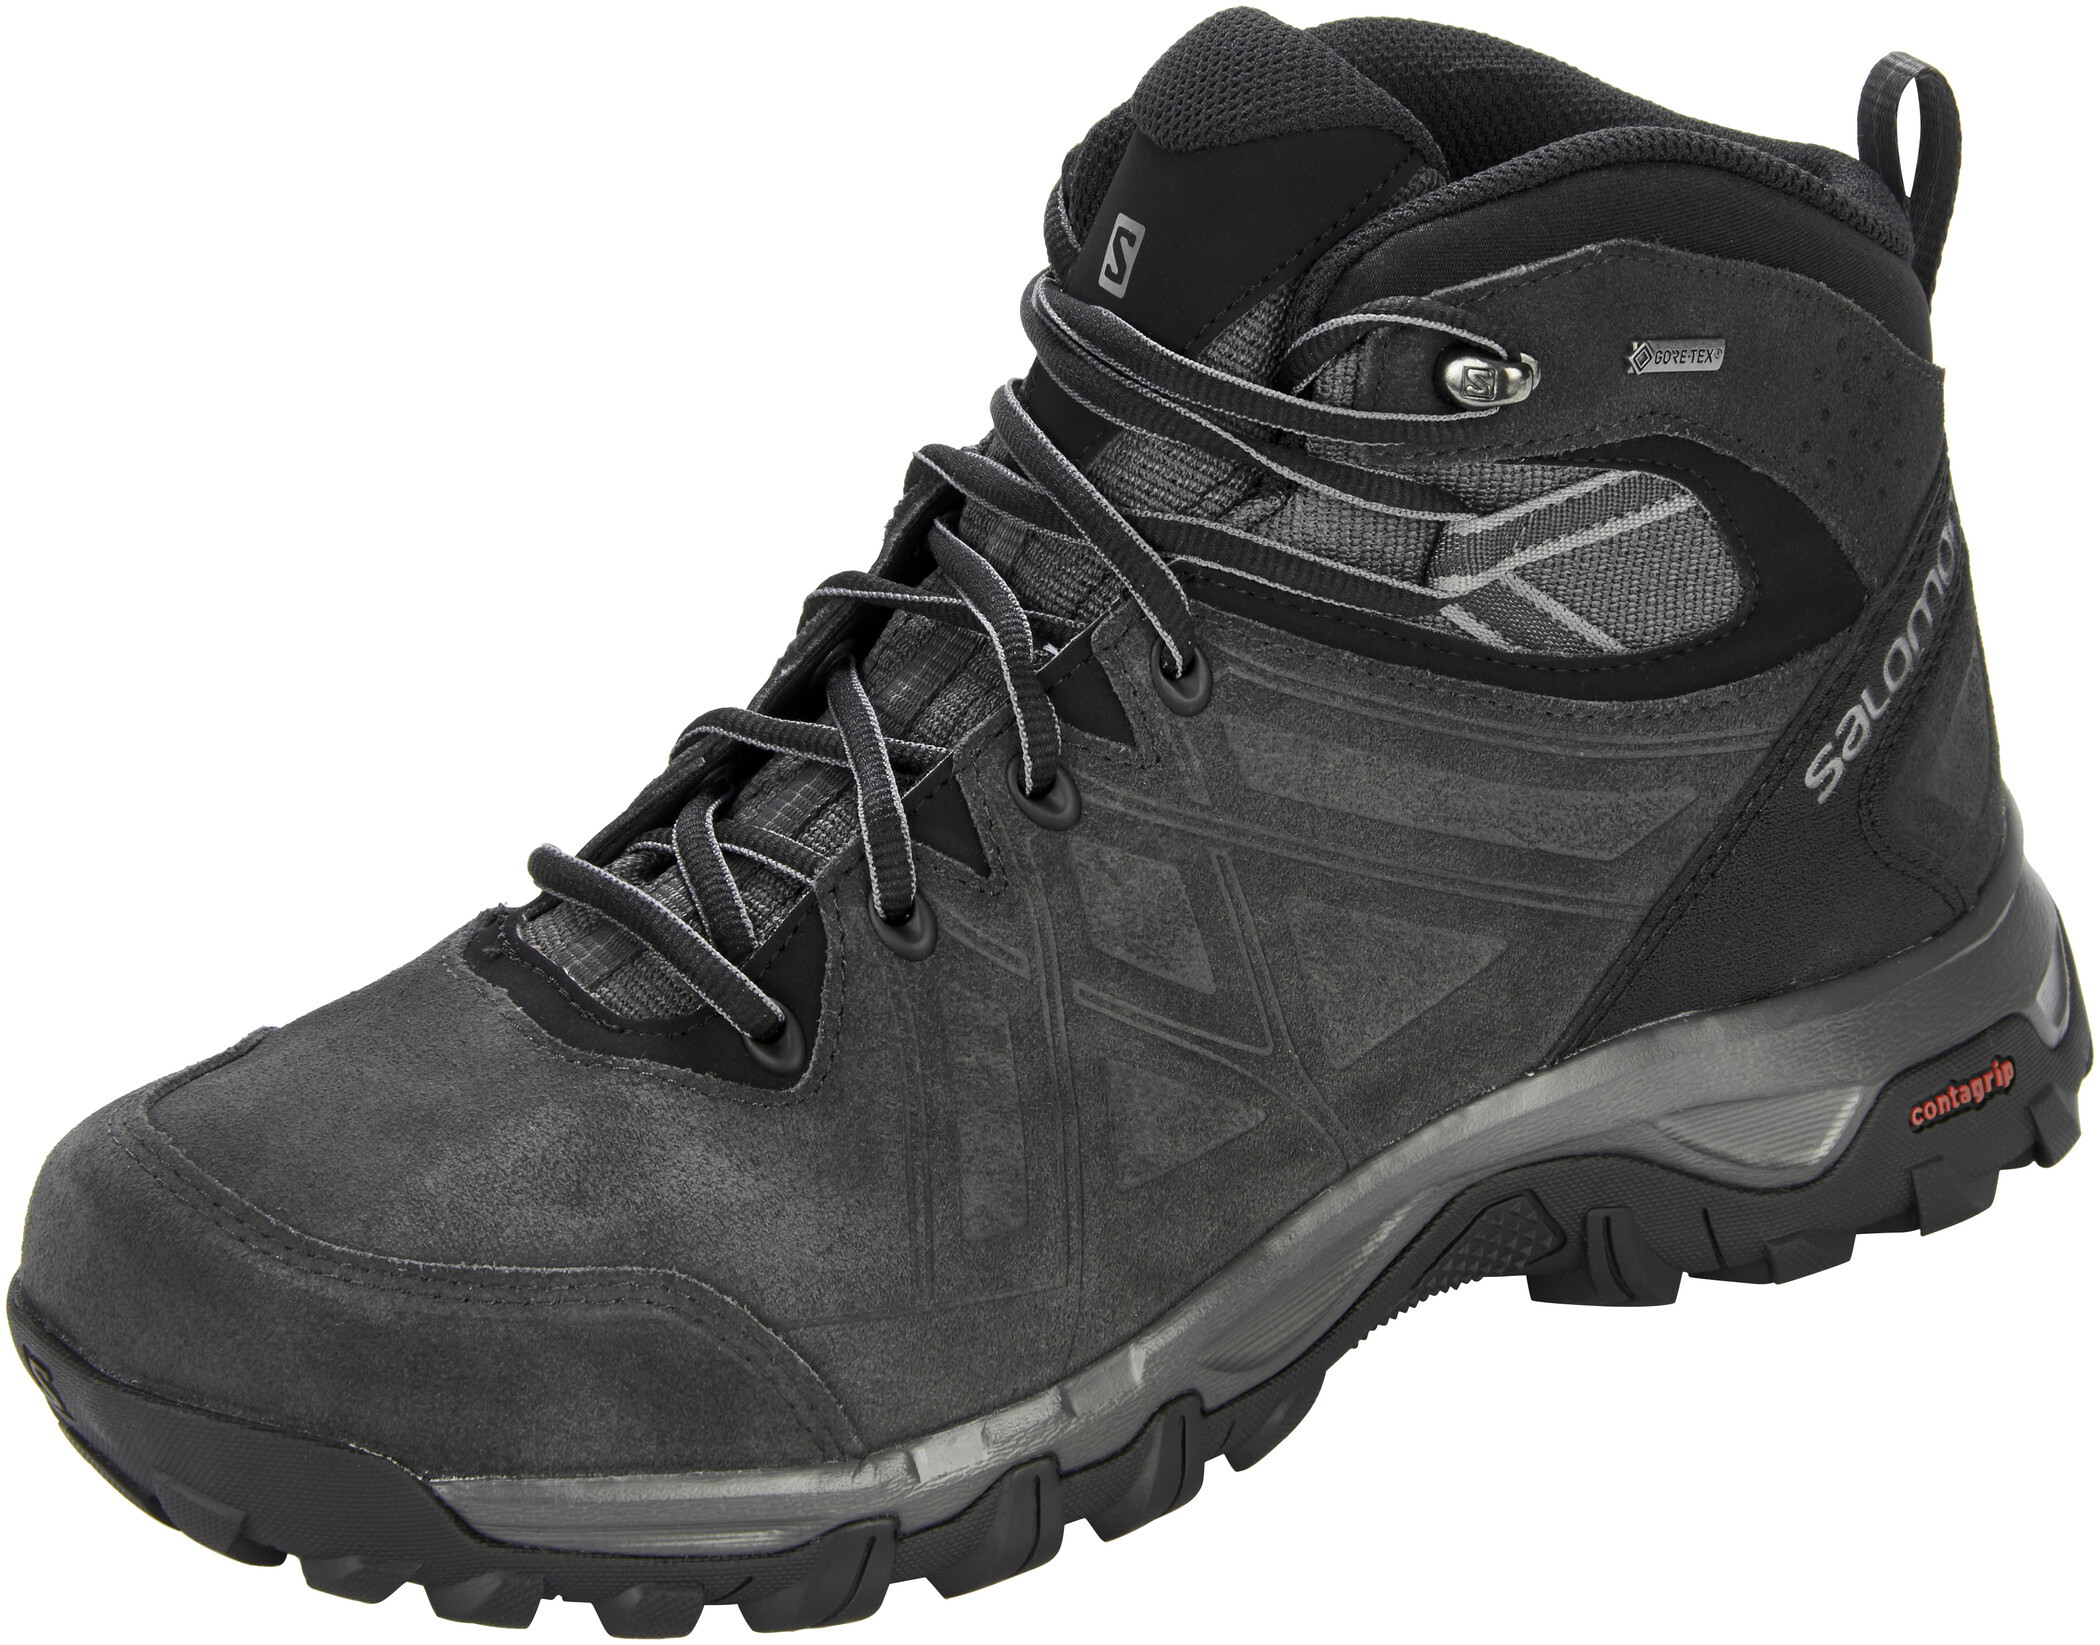 Salomon Evasion 2 Mid LTR GTX Shoes Herr magnetphantomquiet shade